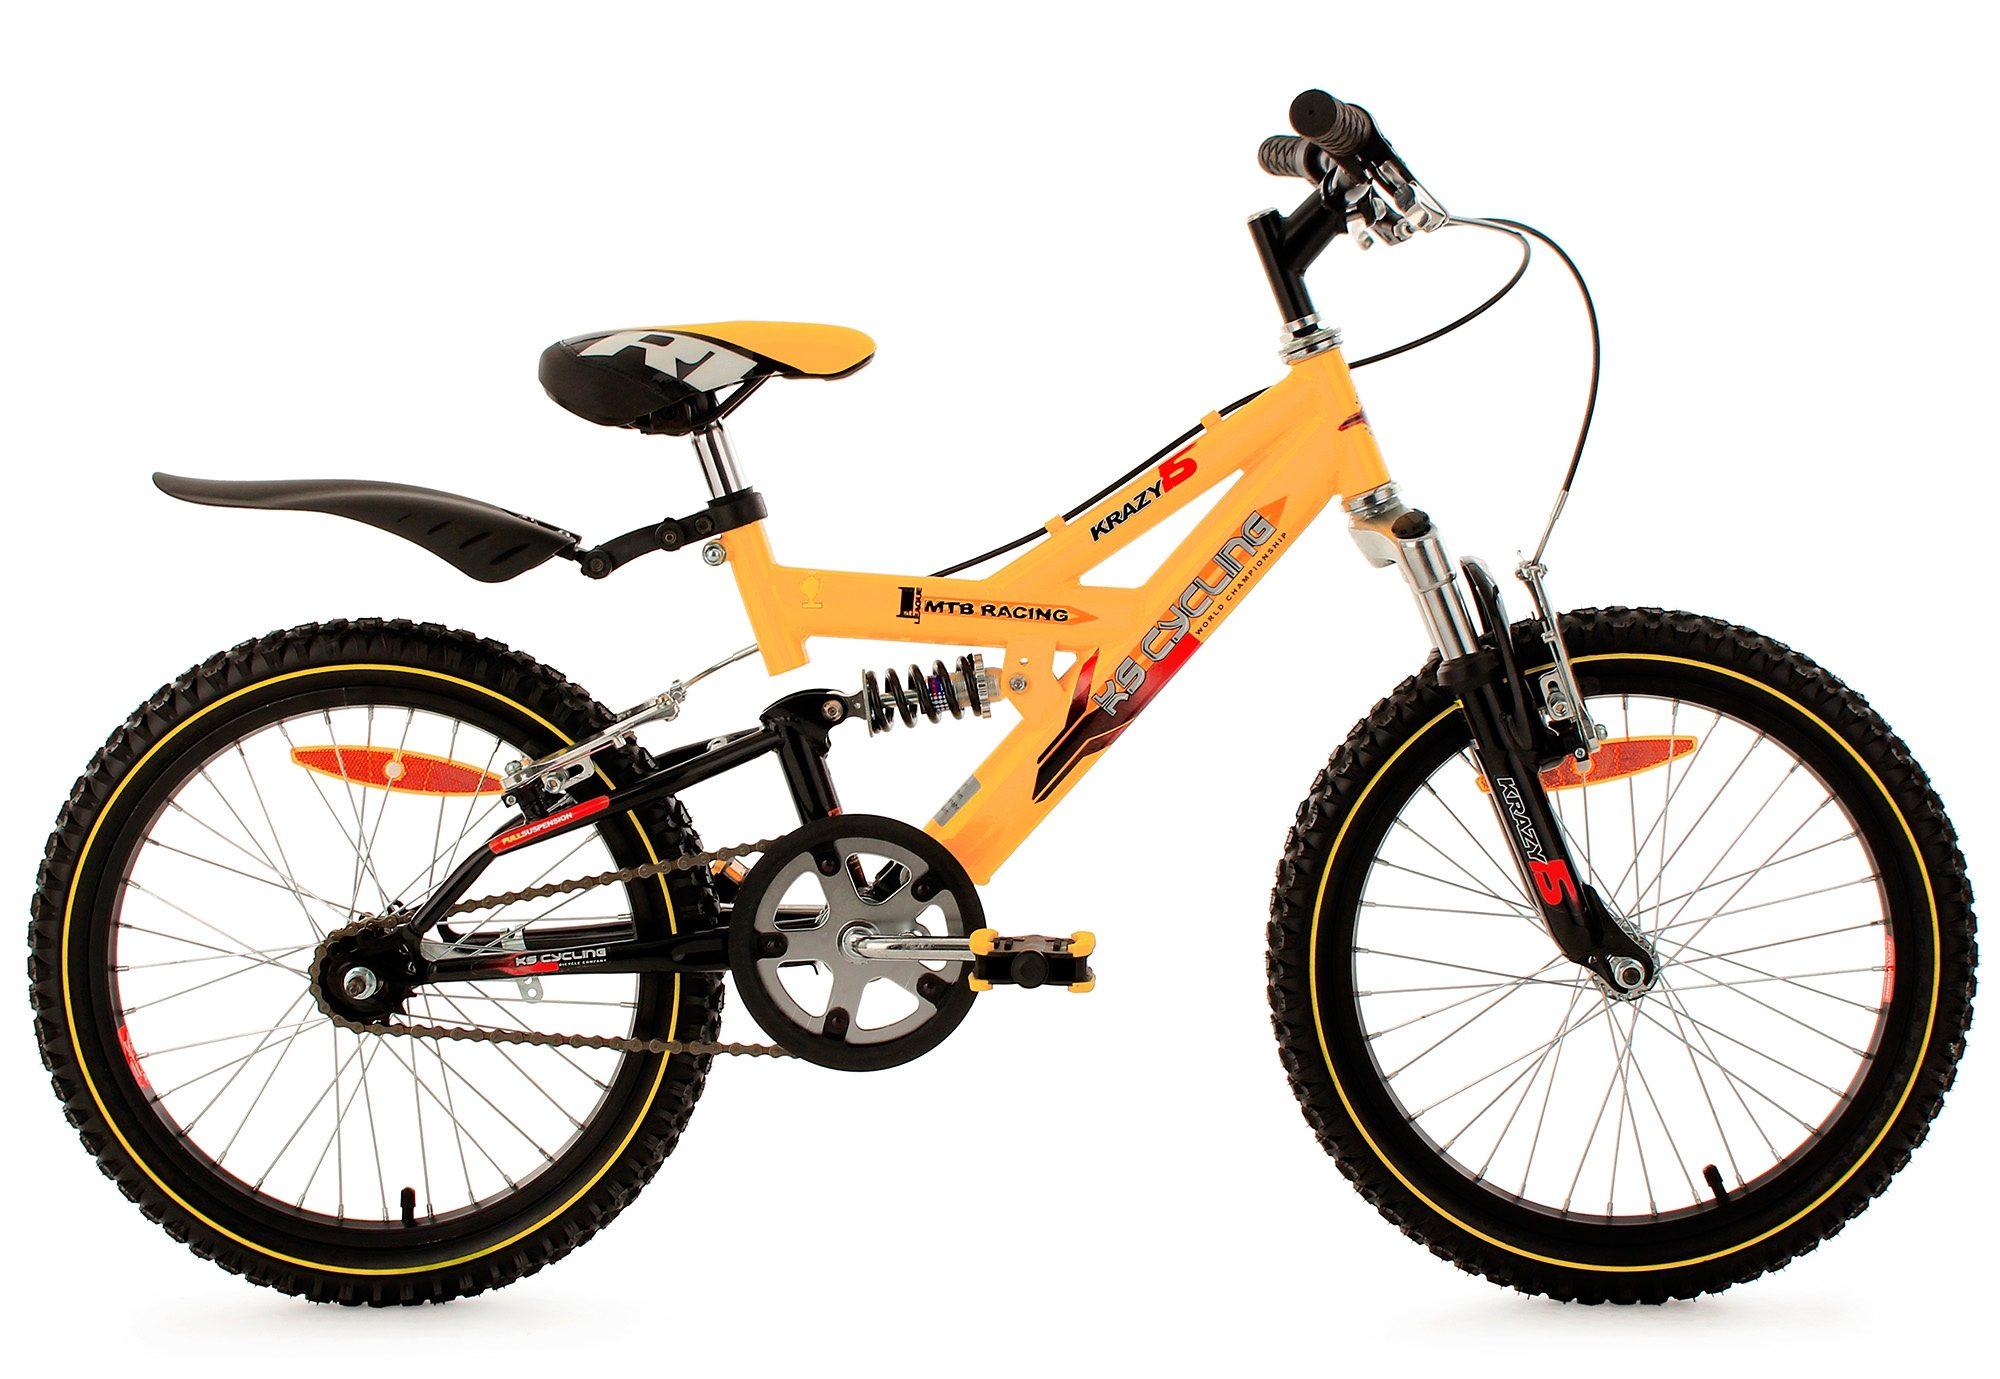 Kinderfahrrad, MTB, KS Cycling, »Krazy«, 18 Zoll, gelb, ohne Schaltung, Rücktritt